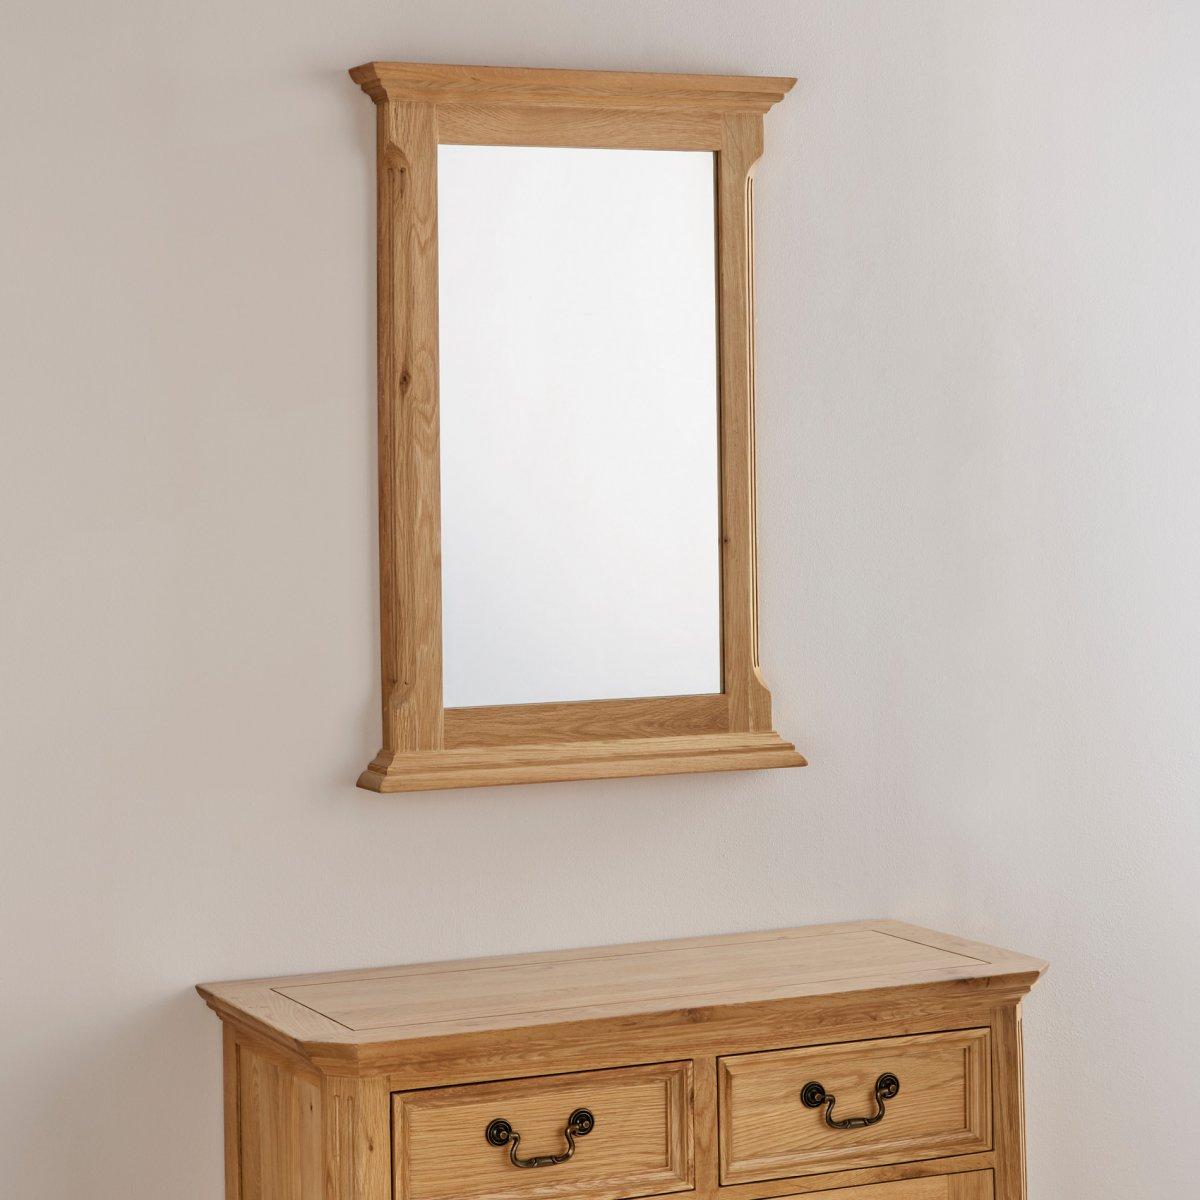 Edinburgh 900mm x 600mm mirror in natural solid oak edinburgh natural solid oak 900mm x 600mm wall mirror amipublicfo Choice Image